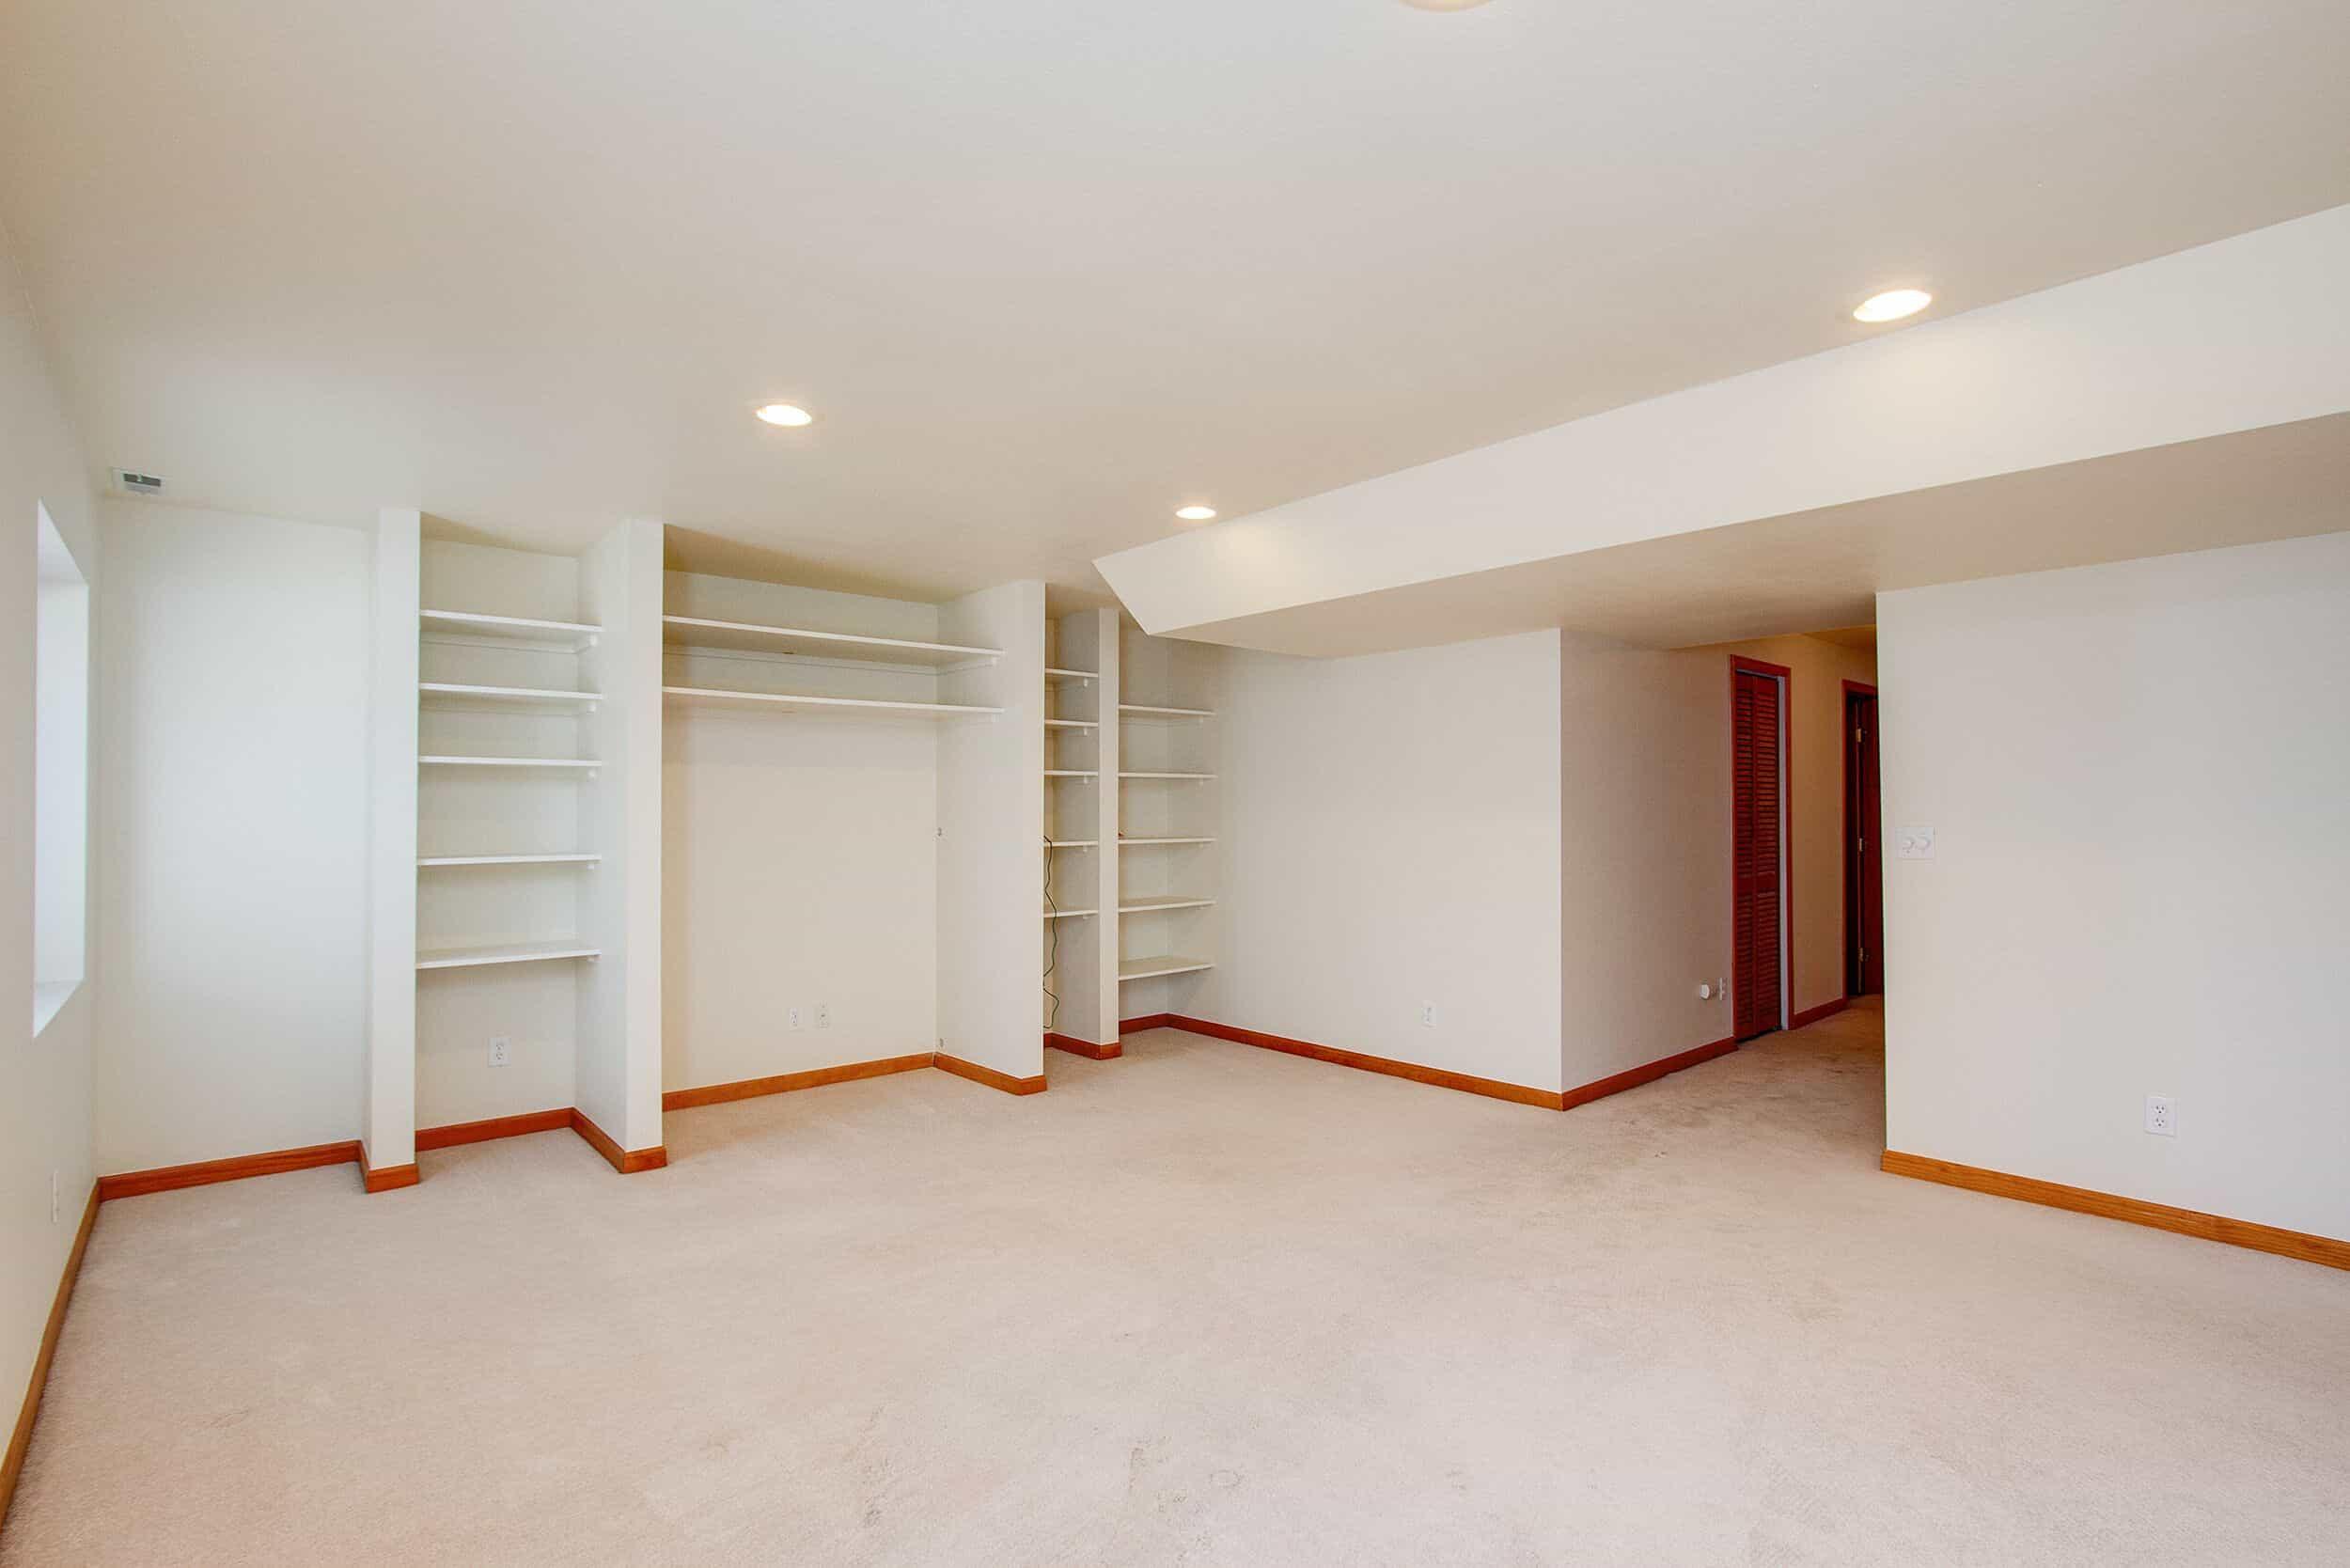 Basement Family Room with Built-In Shelves